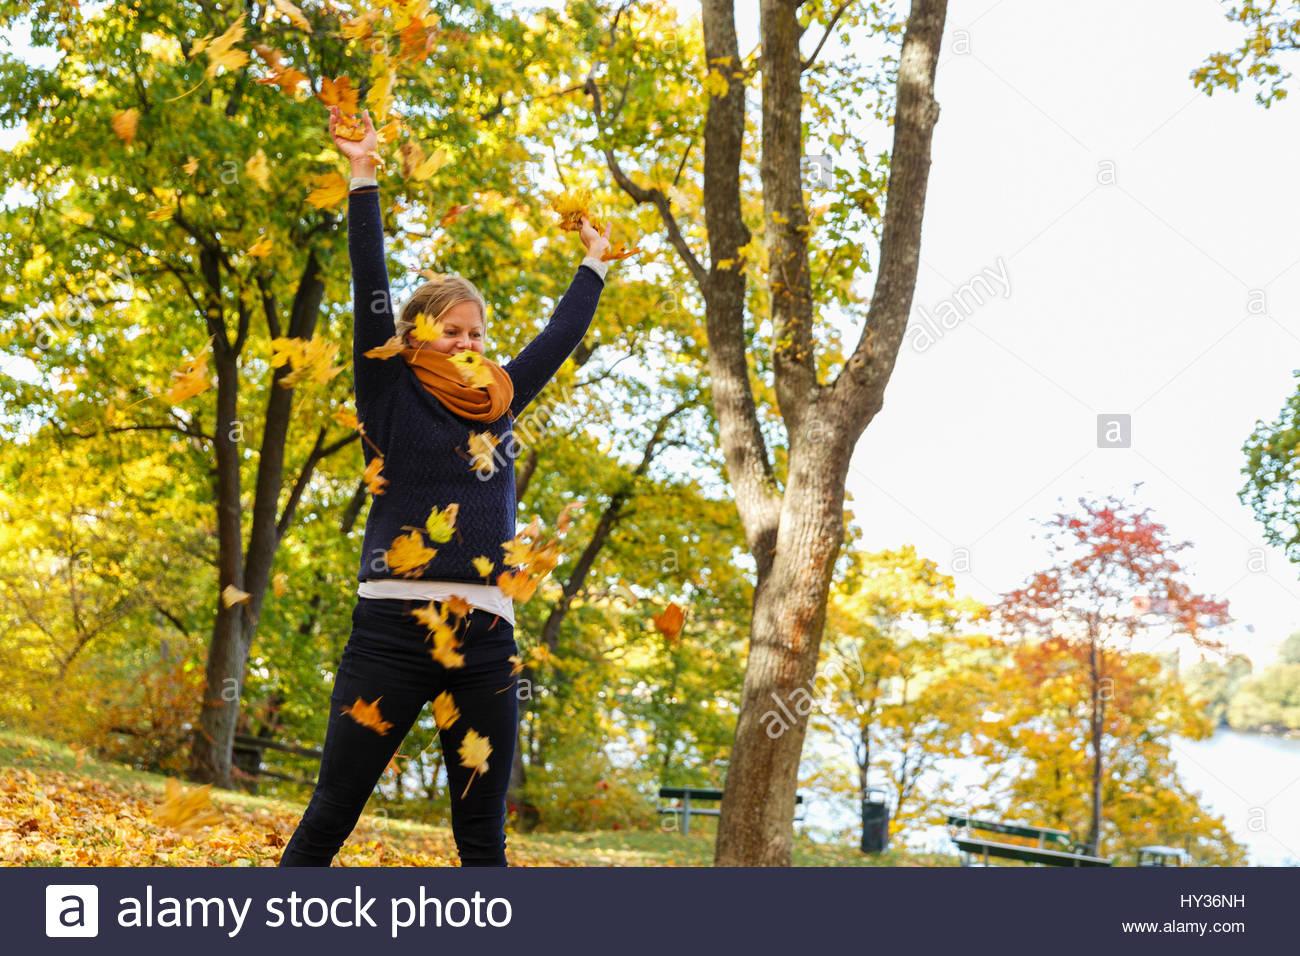 Sweden, Sodermanland, Stockholm, Sodermalm, Langholmen, Mid adult woman throwing autumn leaves - Stock Image